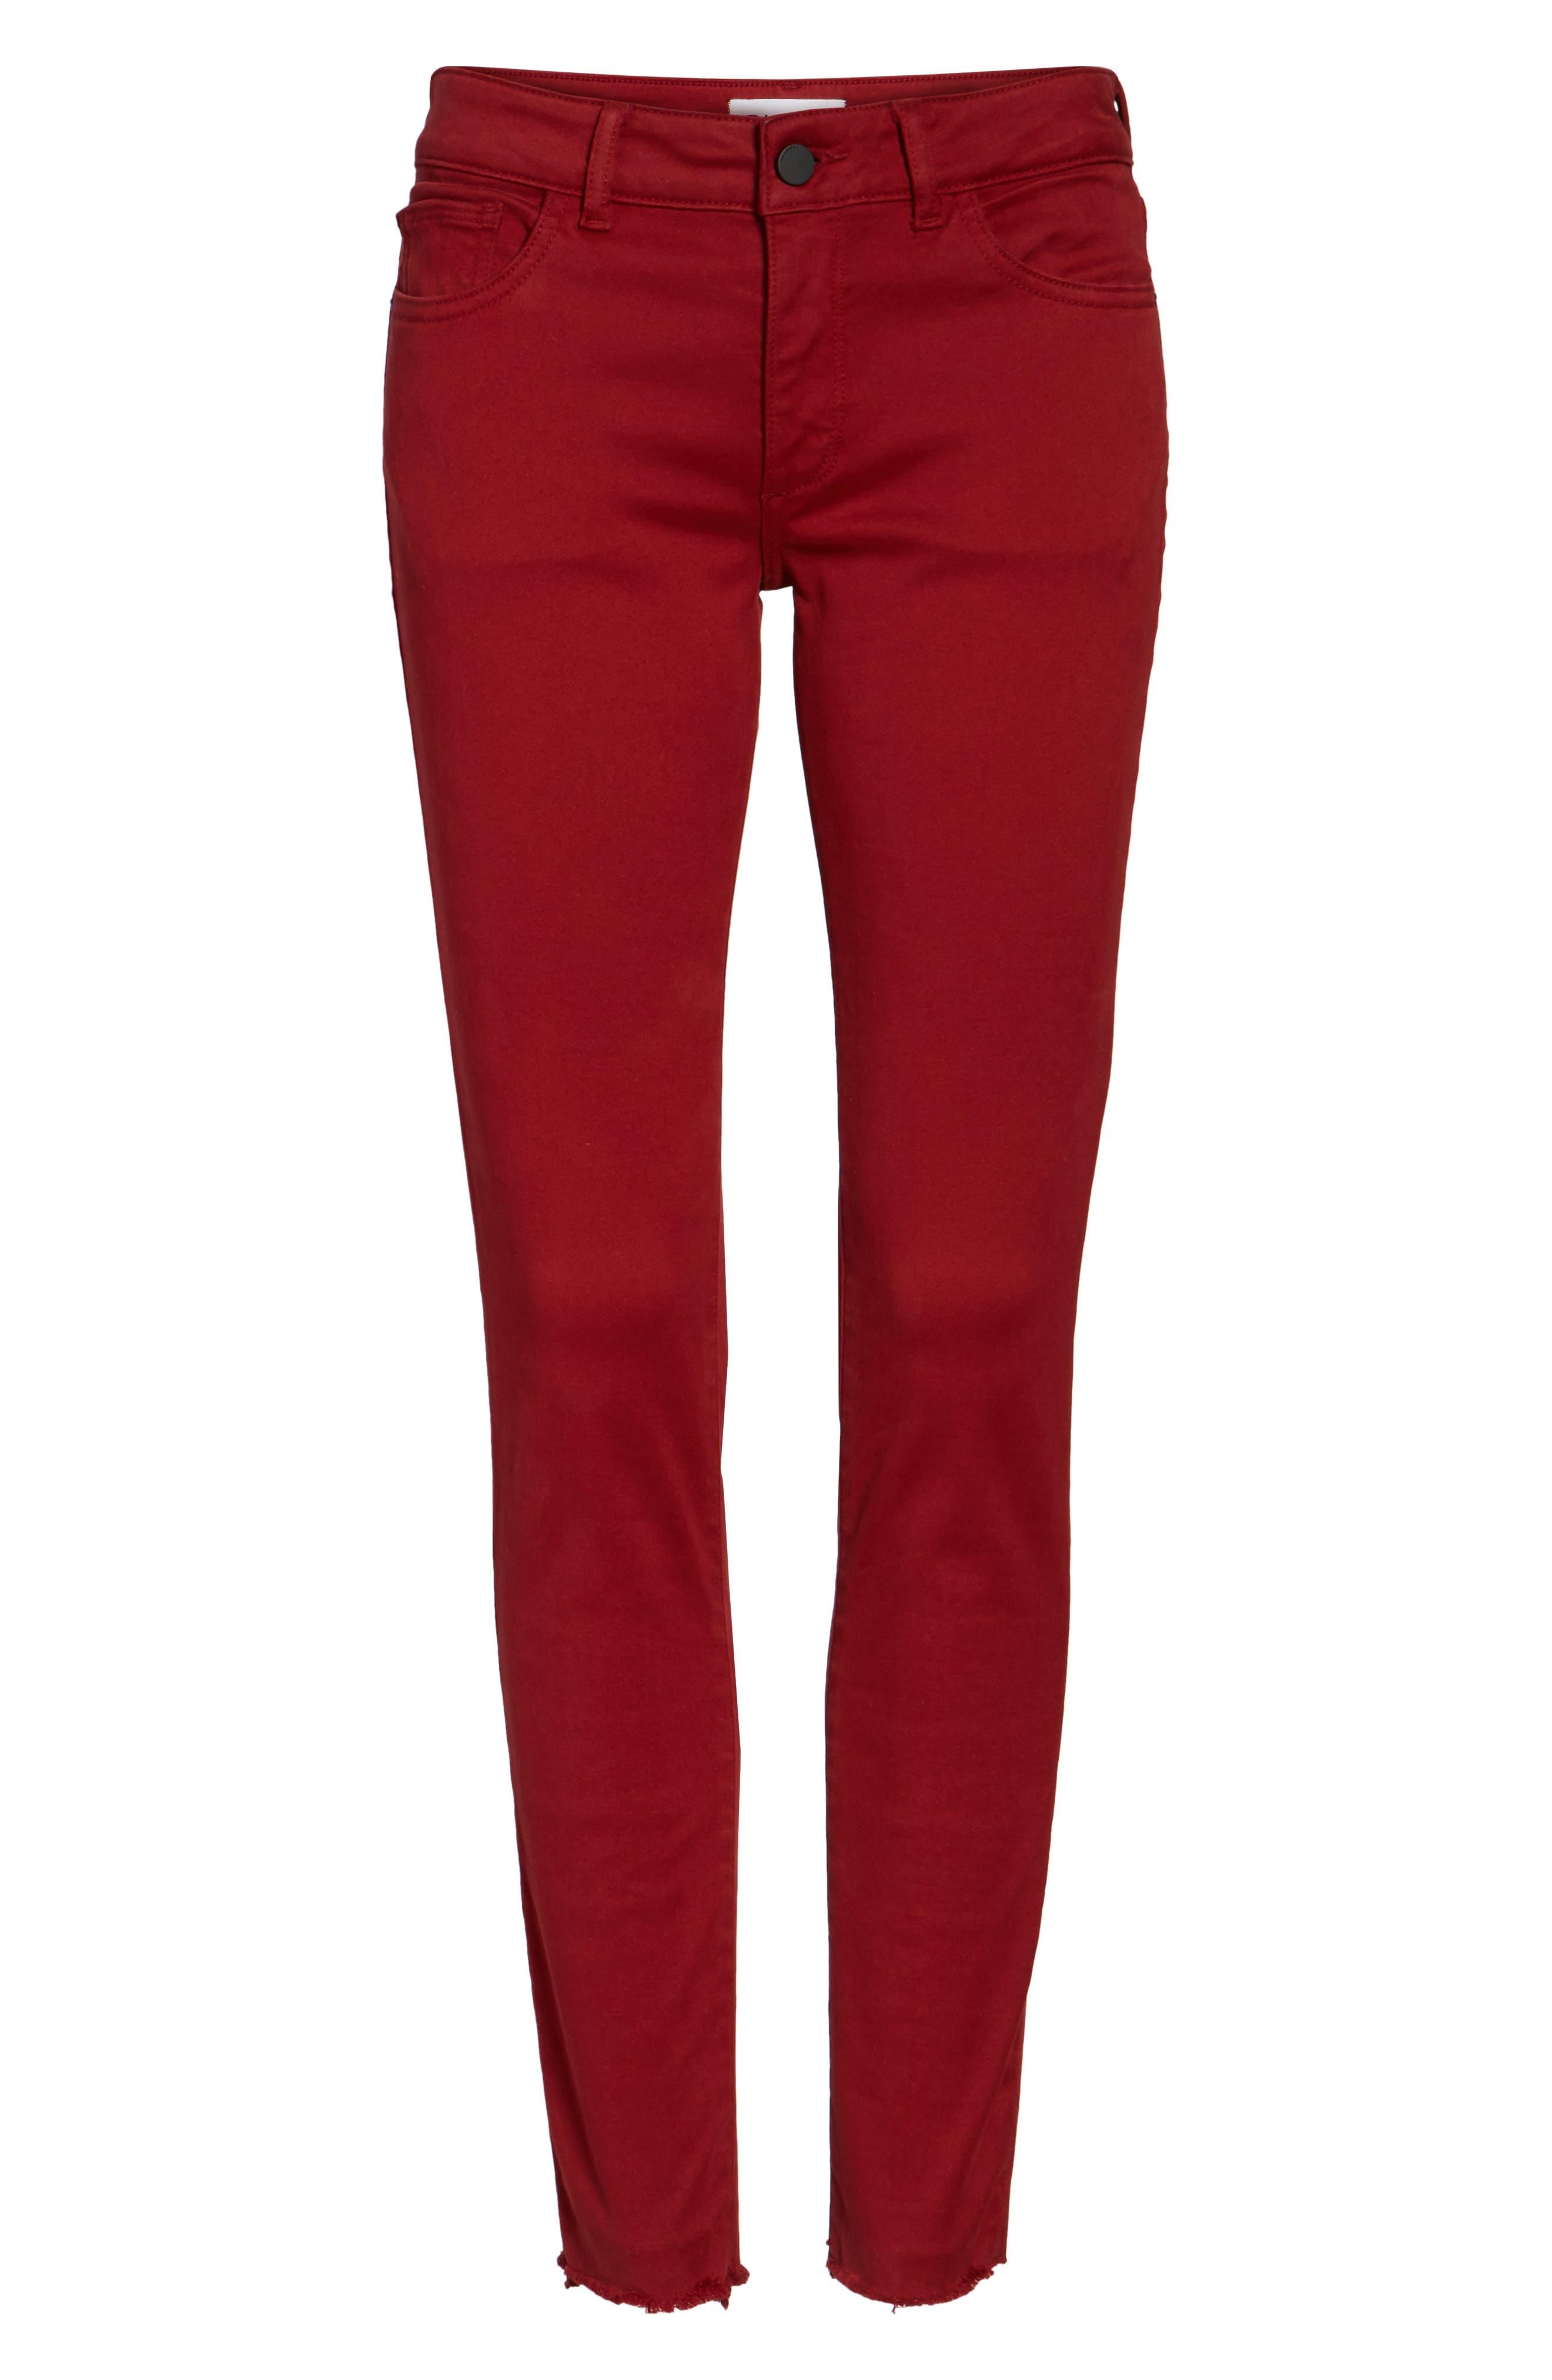 Emma Power Legging Jeans,                             Alternate thumbnail 6, color,                             609